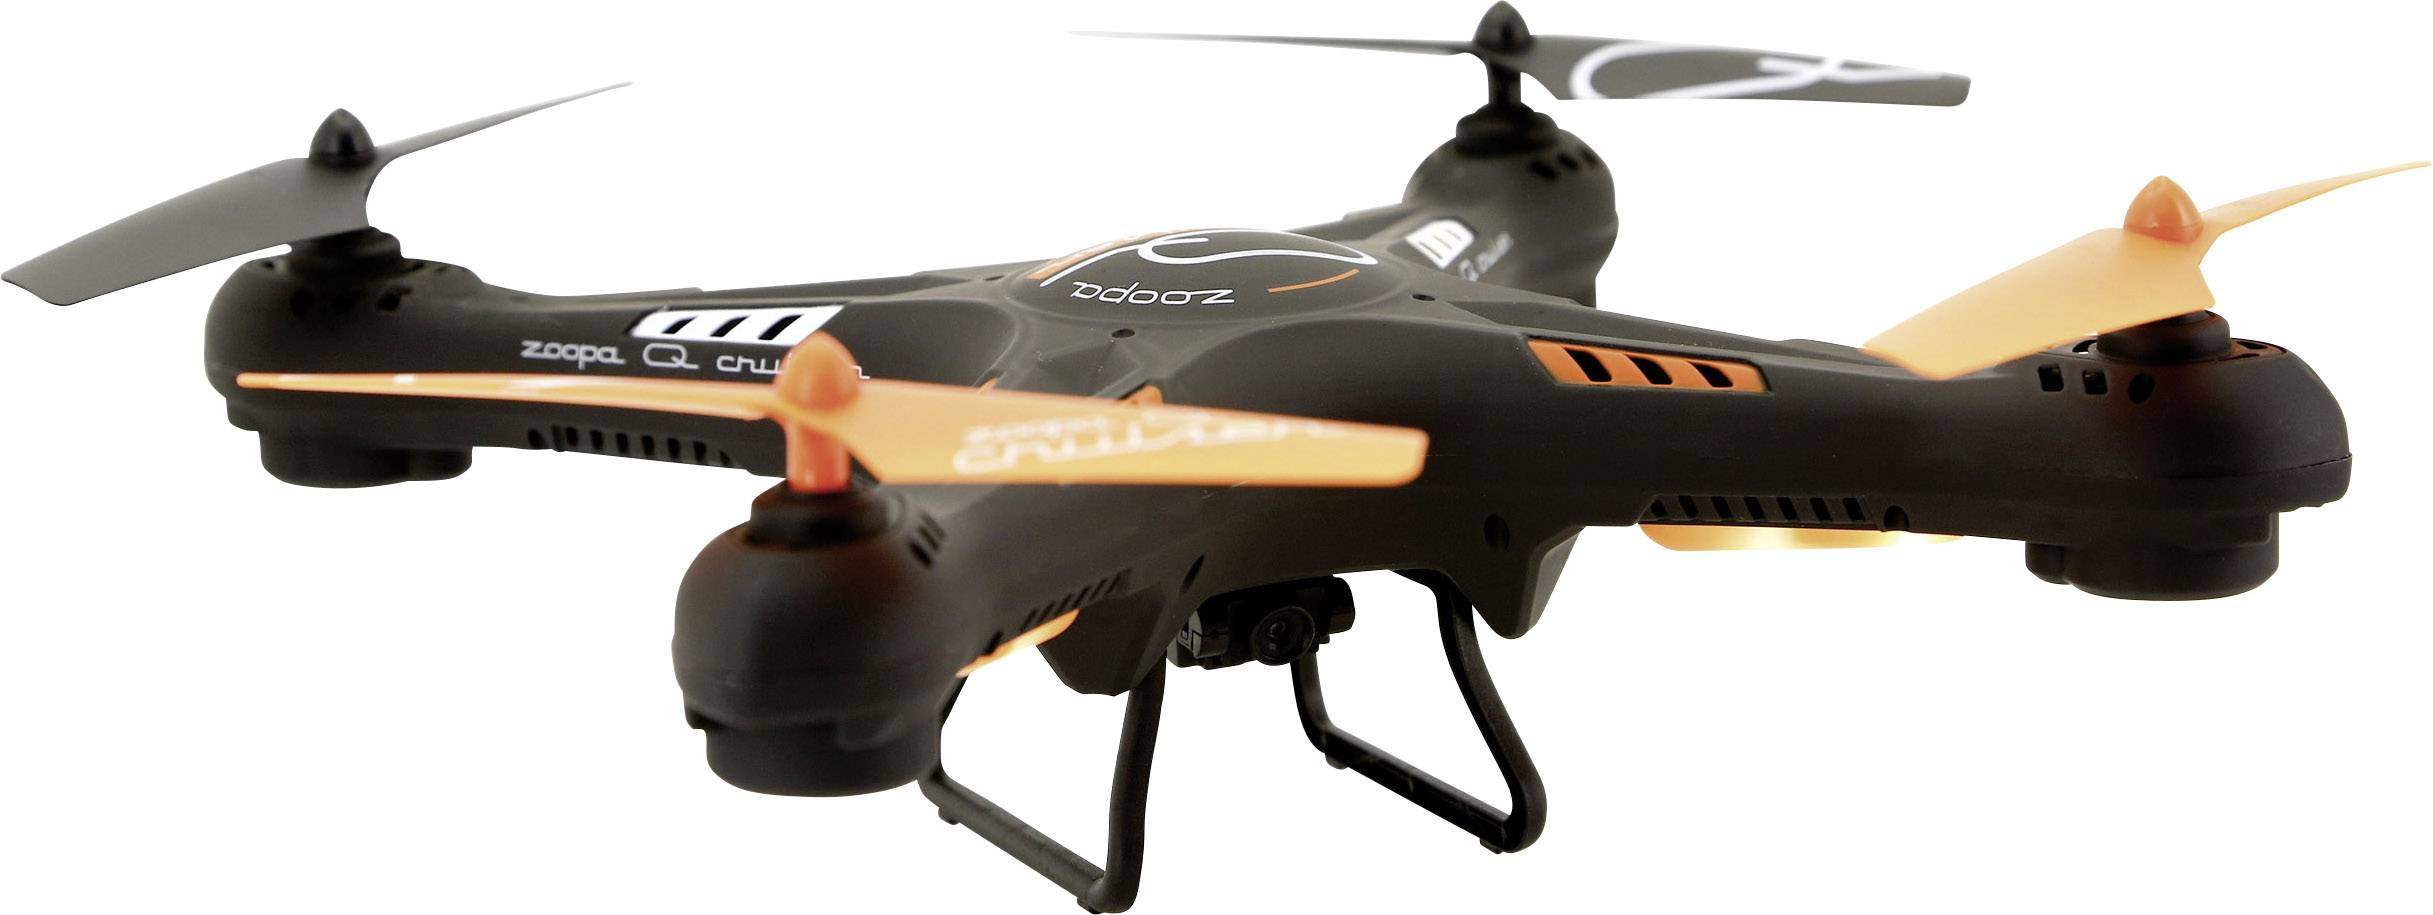 Dron ACME Zoopa Q 420 Cruiser, RtF s HD kamerou